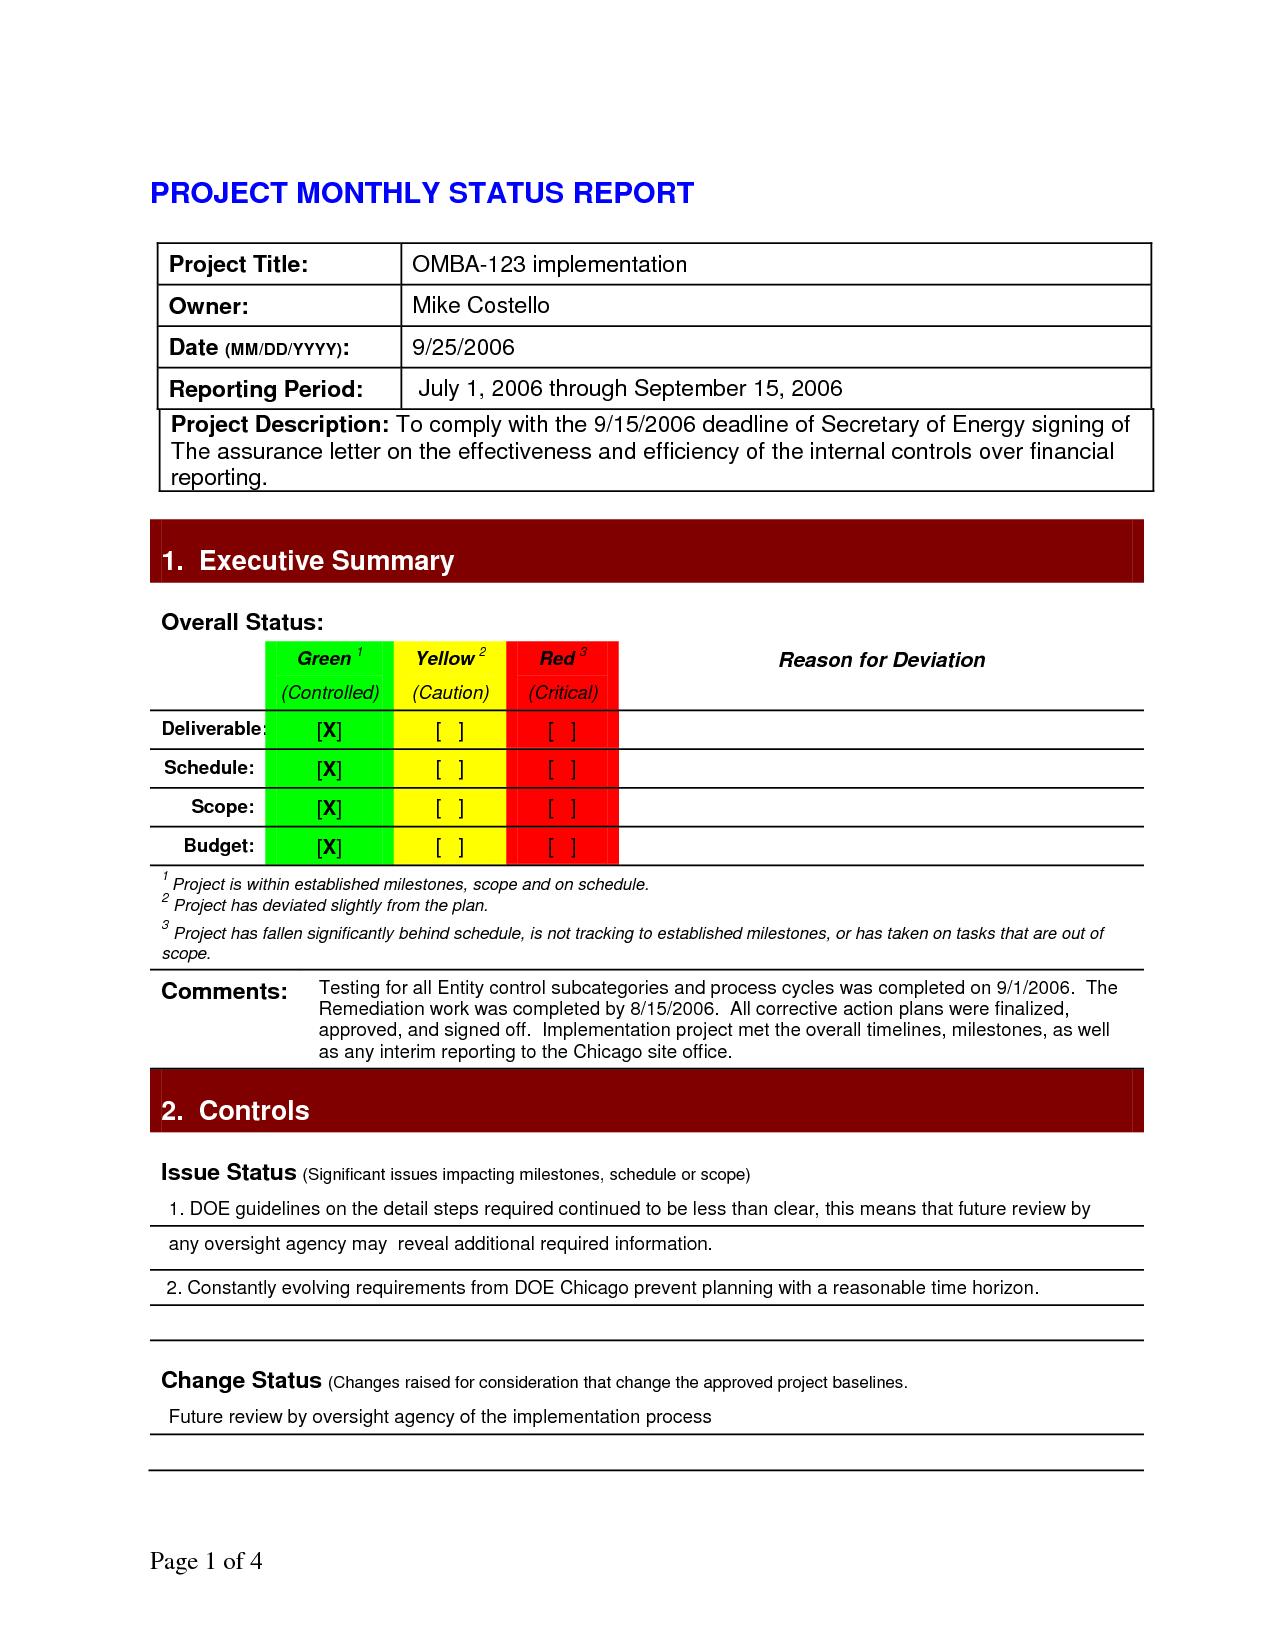 008 Weekly Status Report Template Excel Astounding Ideas For Project Status Report Template Excel Download Filetype Xls